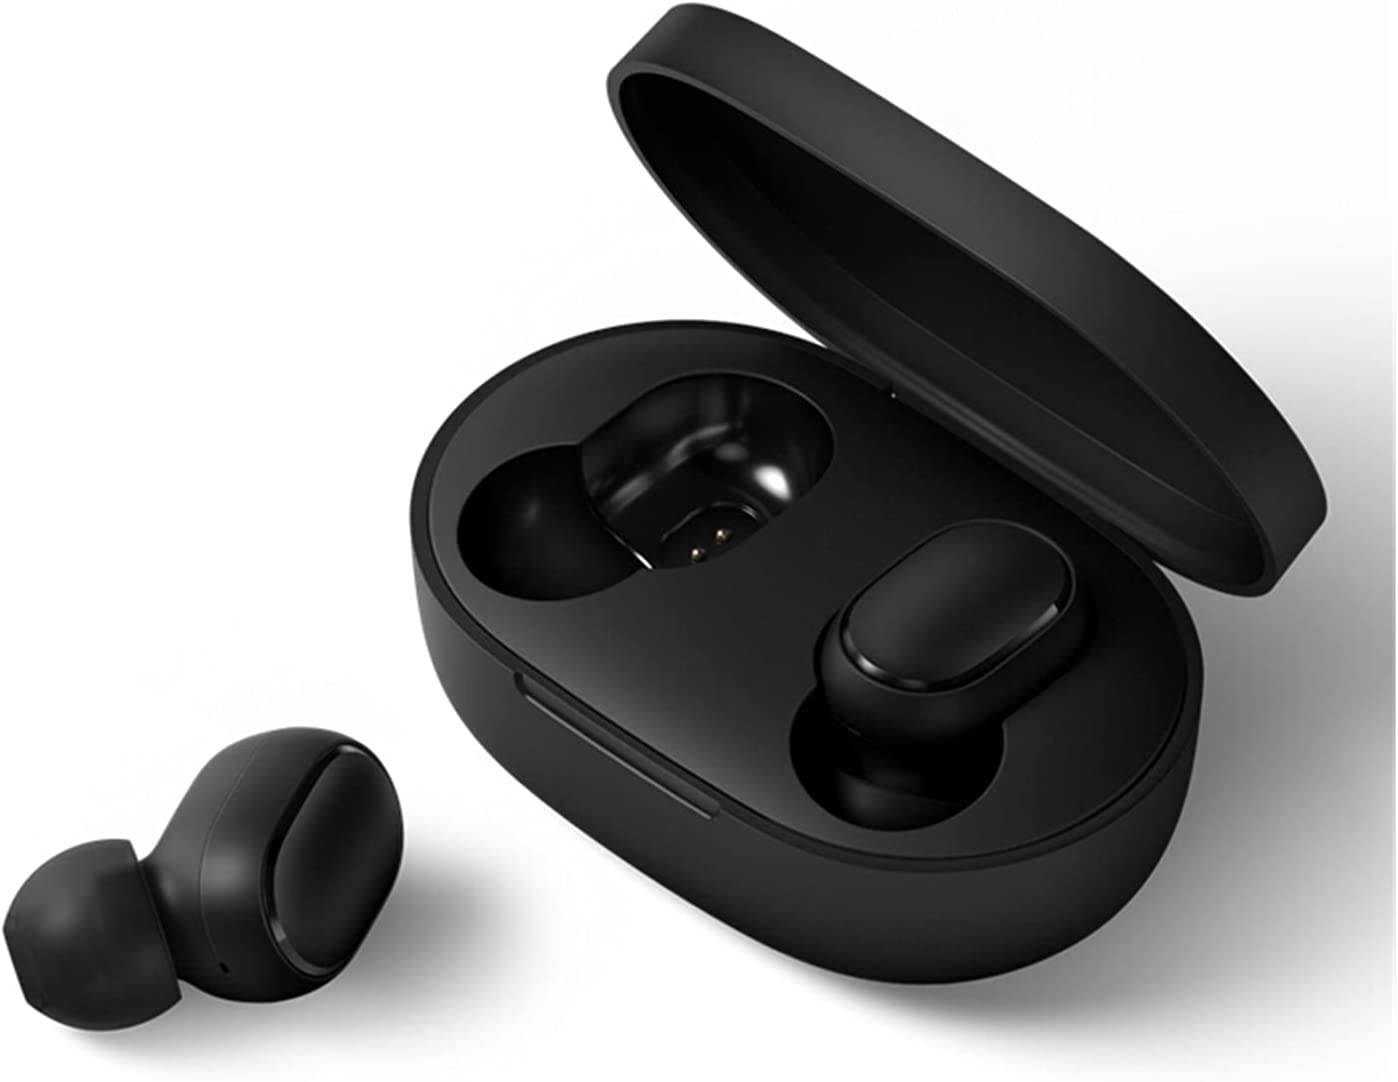 SFLRW Wireless Earbuds Bluetooth Sacramento Mall 5.0 with Char Sport Headphones Cheap mail order shopping